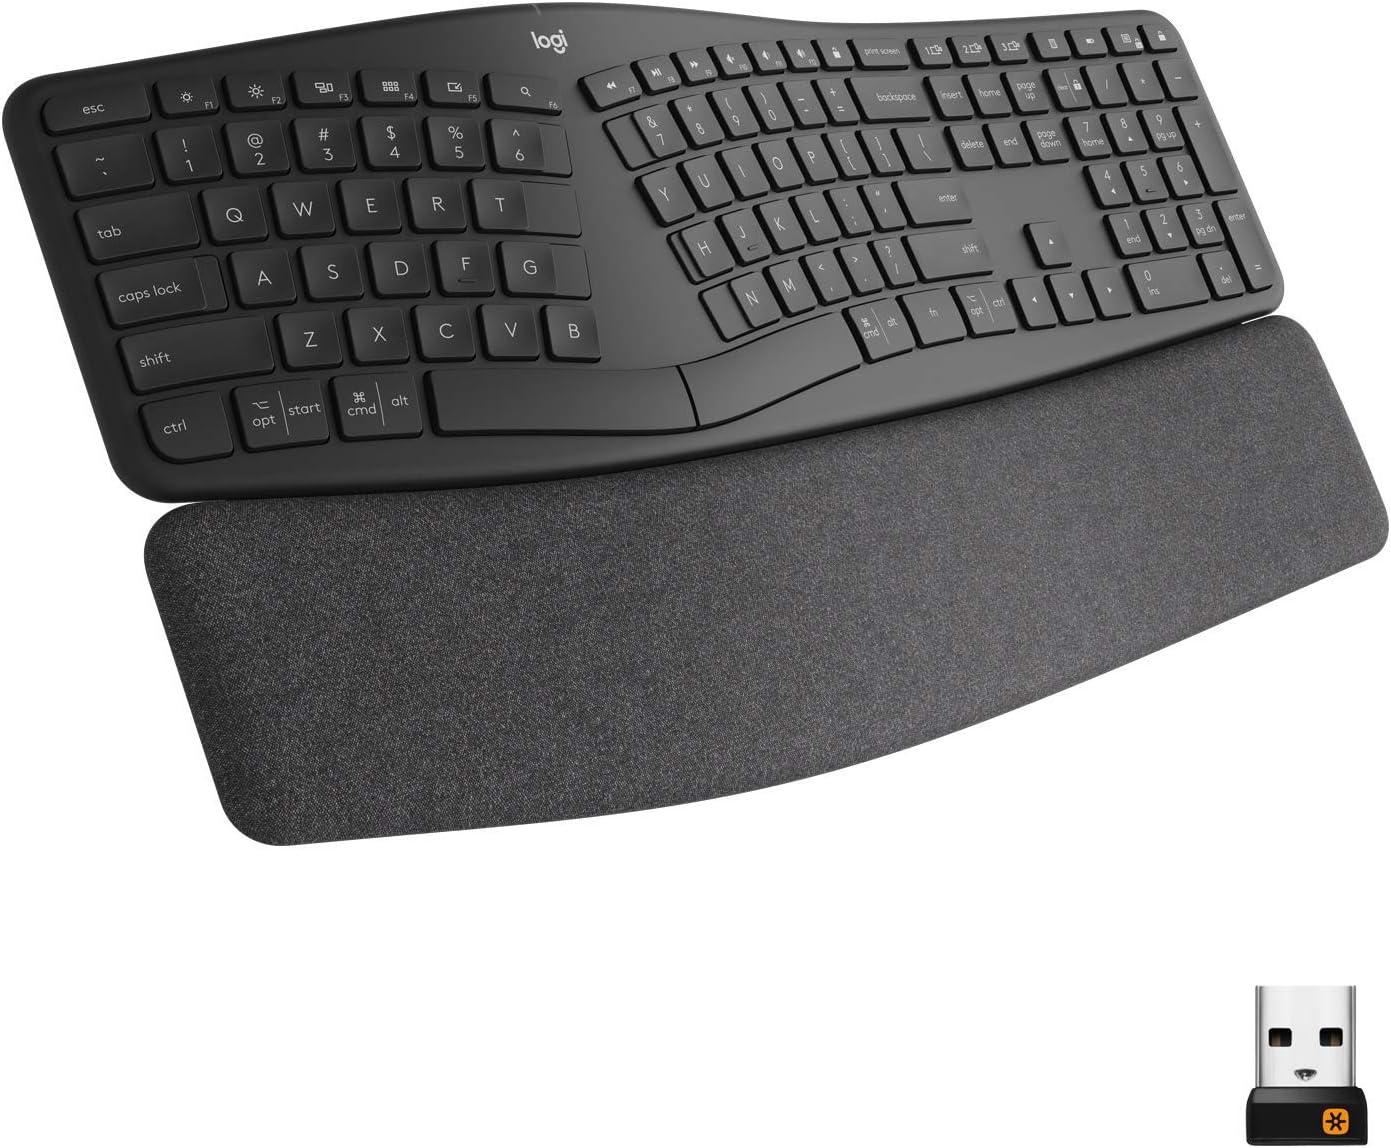 Logitech Ergo K860 Wireless Ergonomic Keyboard with Wrist Rest - Split Keyboard Layout for Windows/Mac, Bluetooth or USB Connectivity (Renewed)